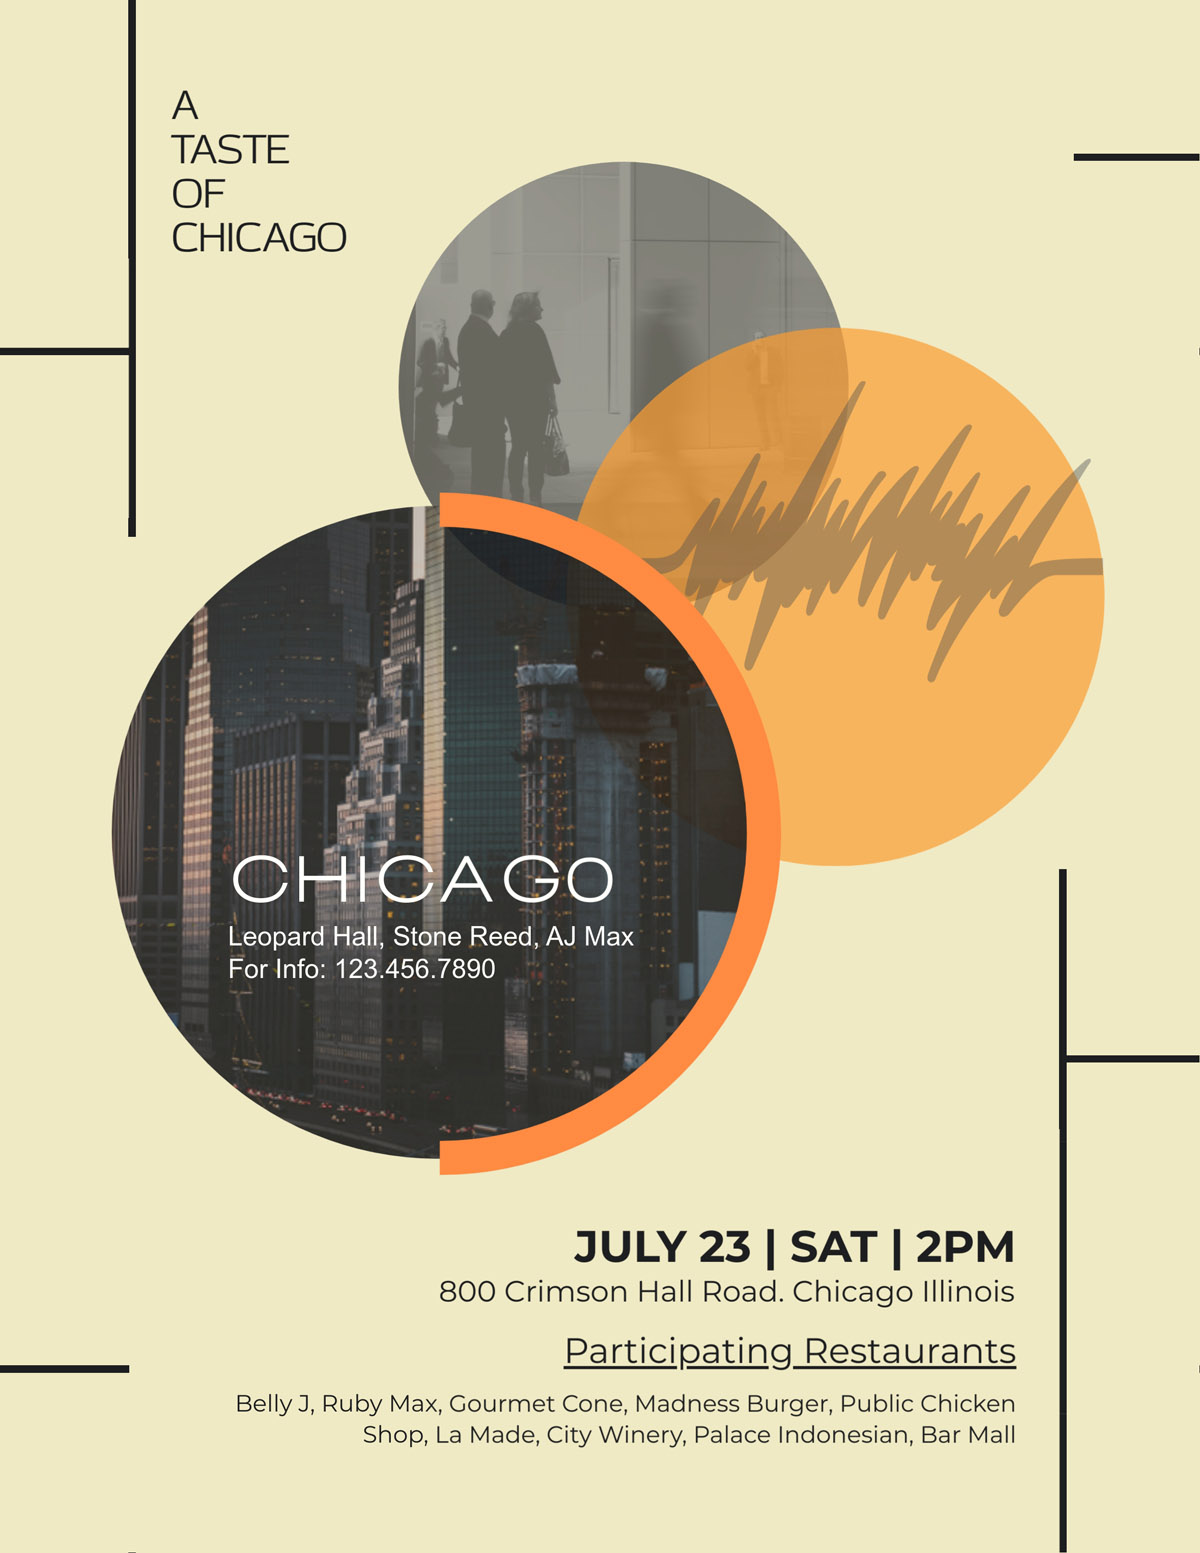 flyer templates - restaurant taste of chicago